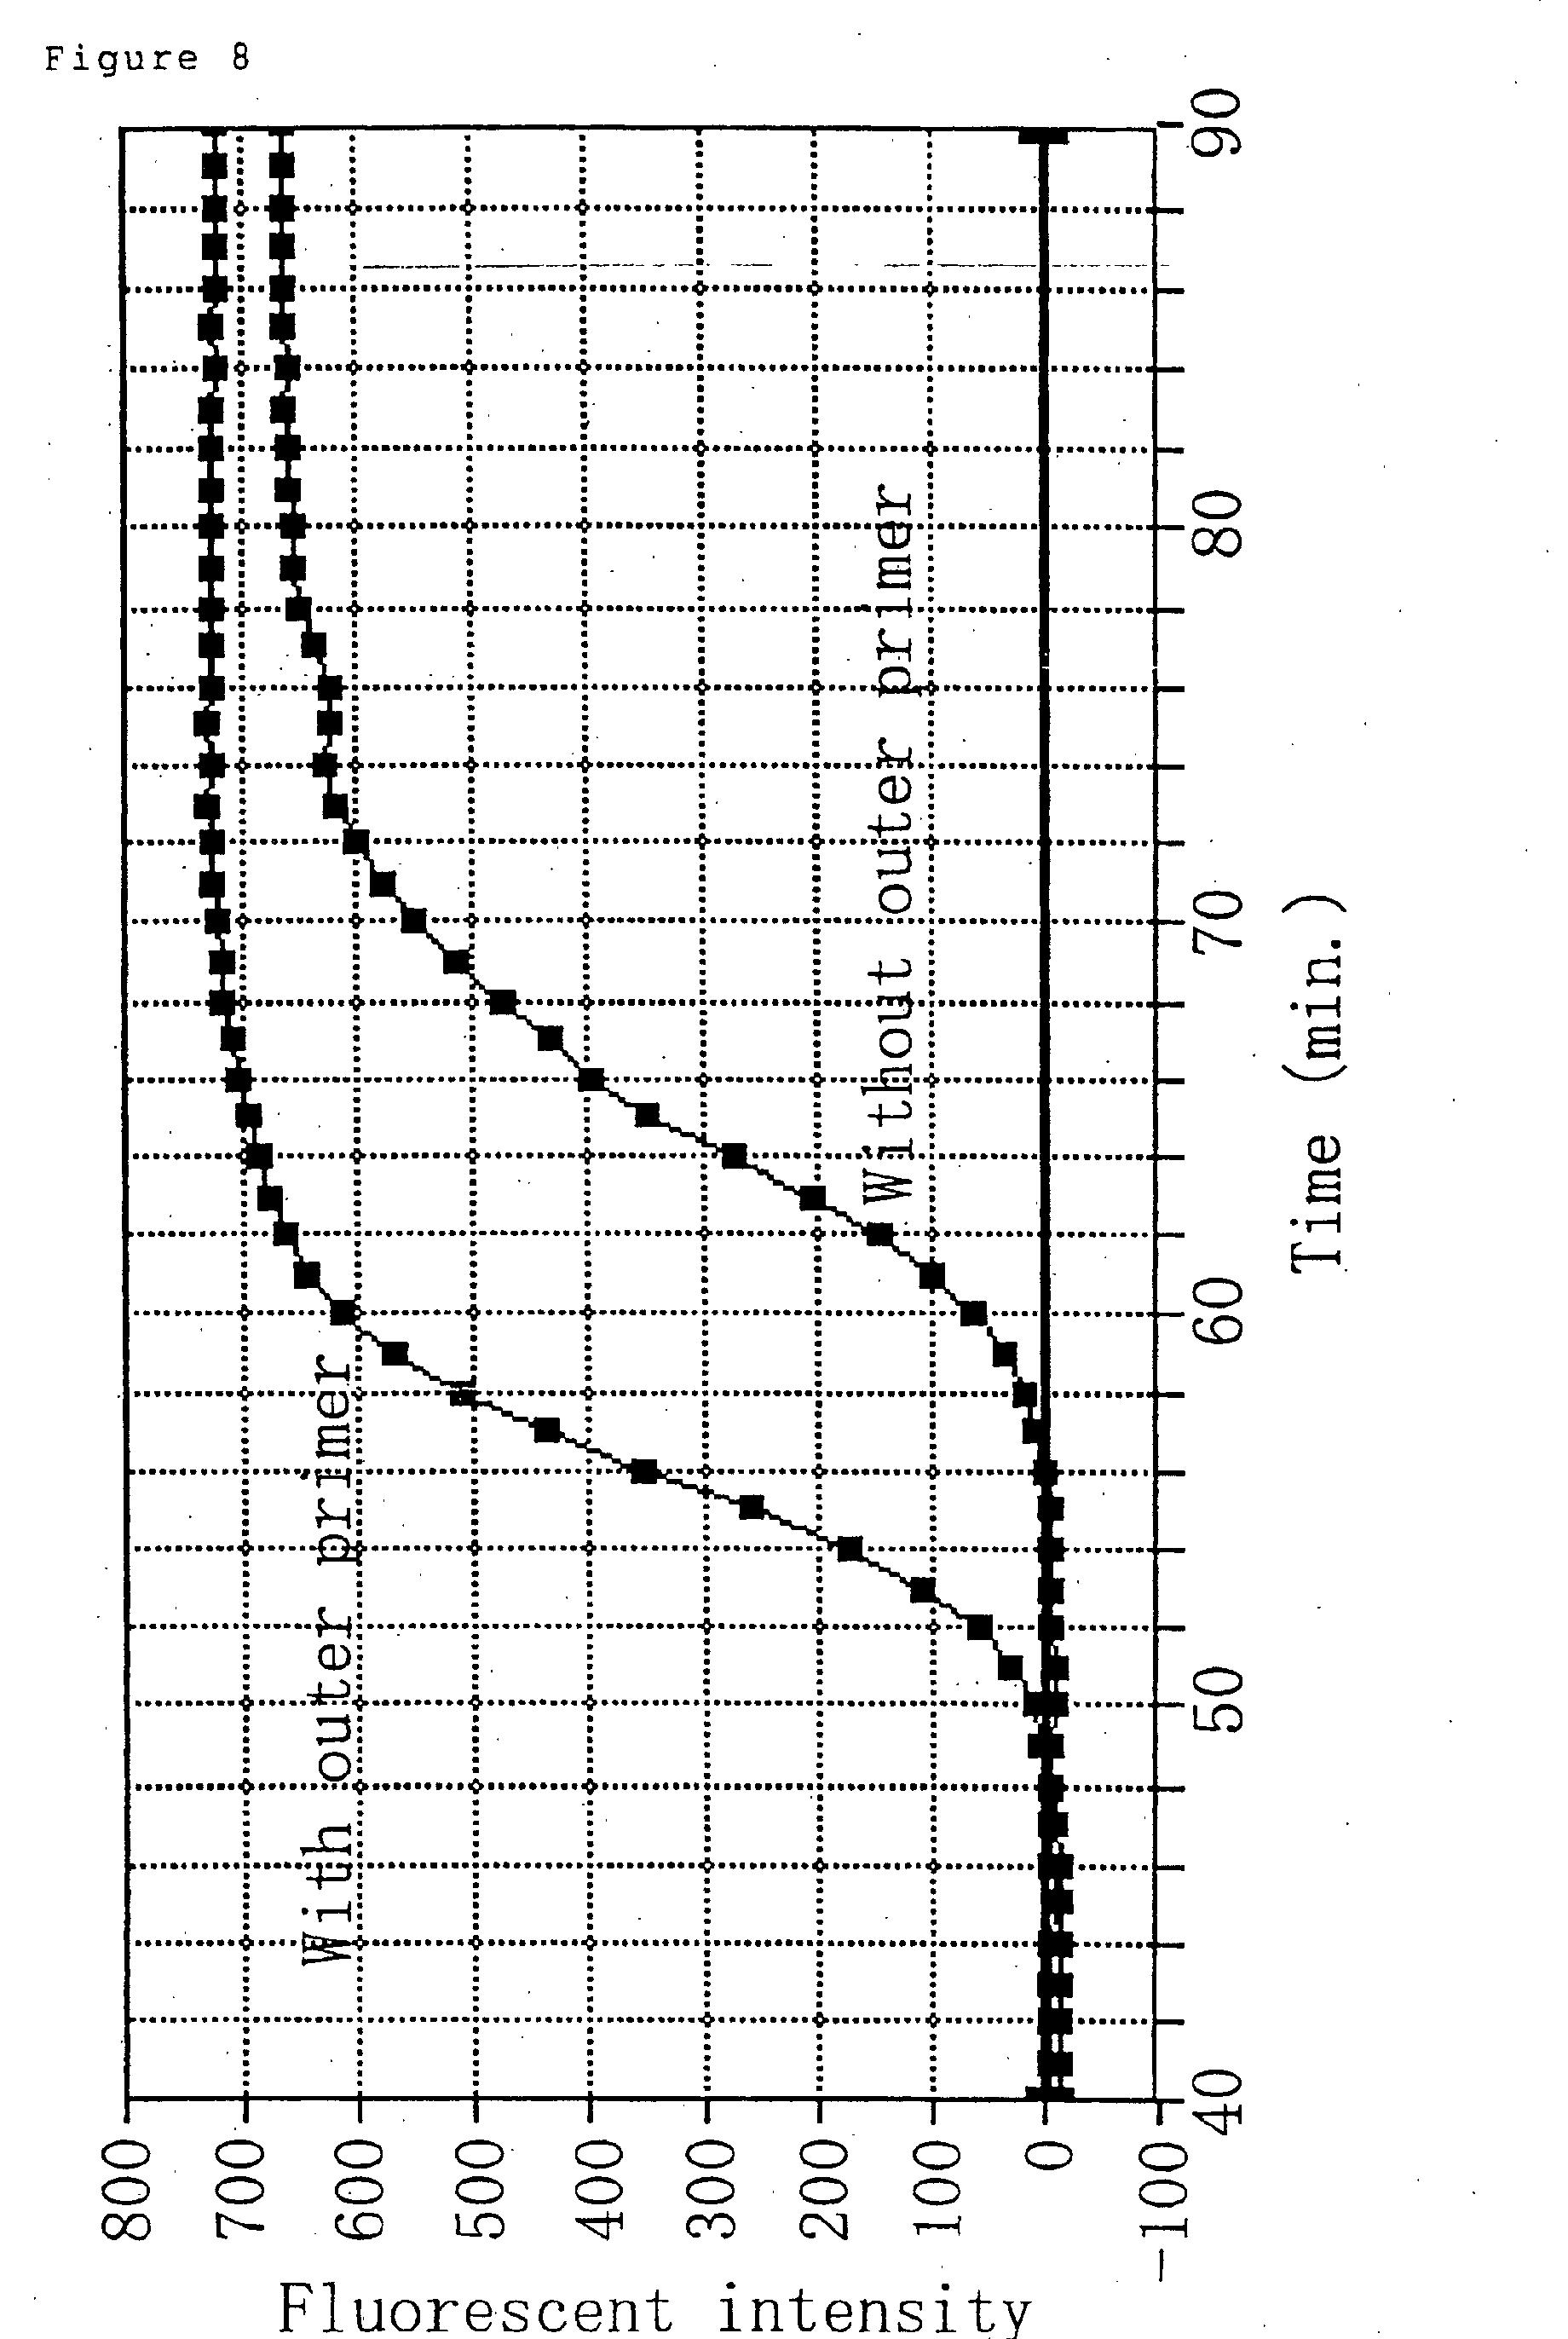 brevet ep1275715a1 procede d 39 amplification d 39 acide nucleique par utilisation d 39 acide nucleique. Black Bedroom Furniture Sets. Home Design Ideas